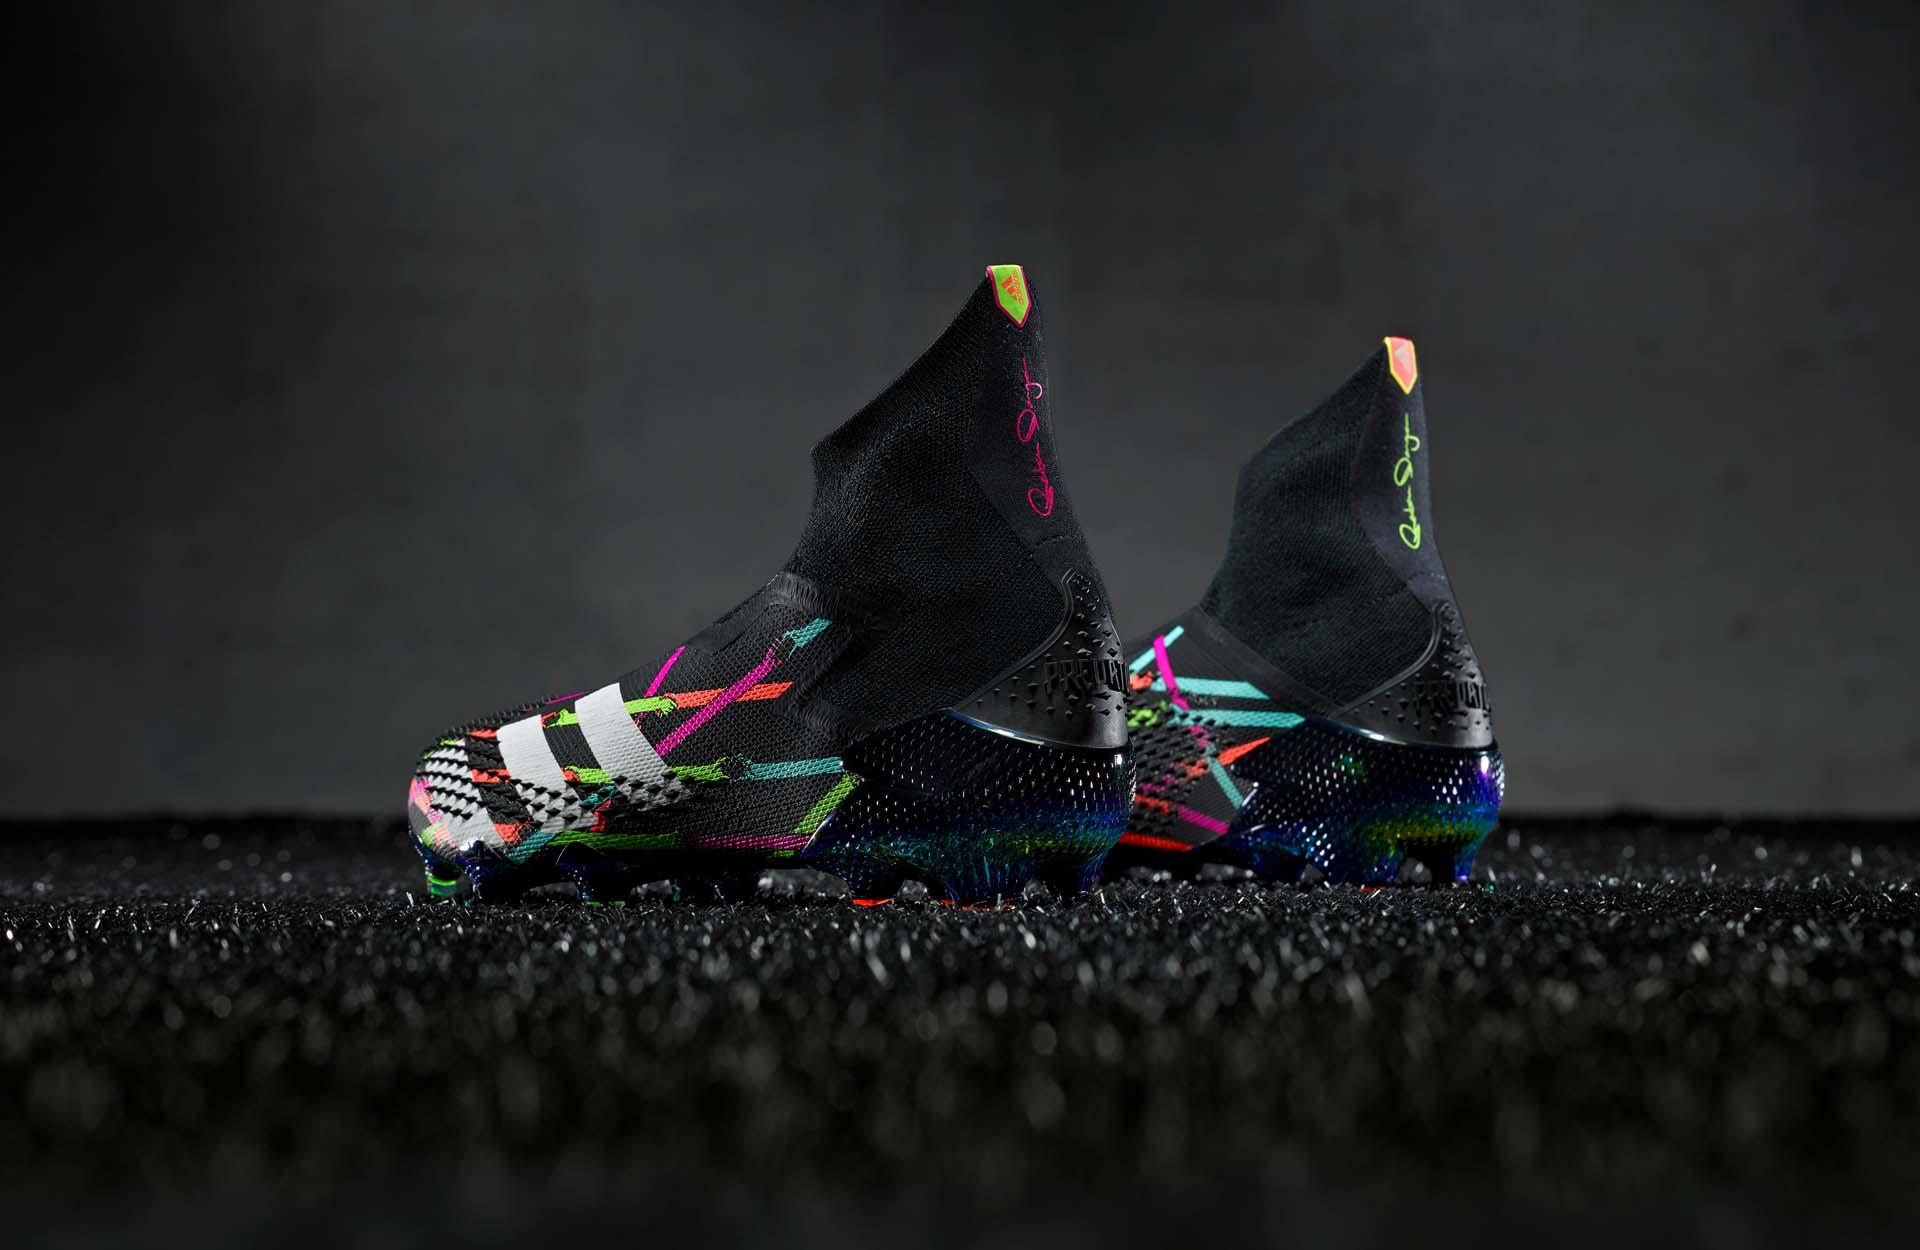 adidas x Reuben Dangoor Reveal Limited Edition Predator 20+